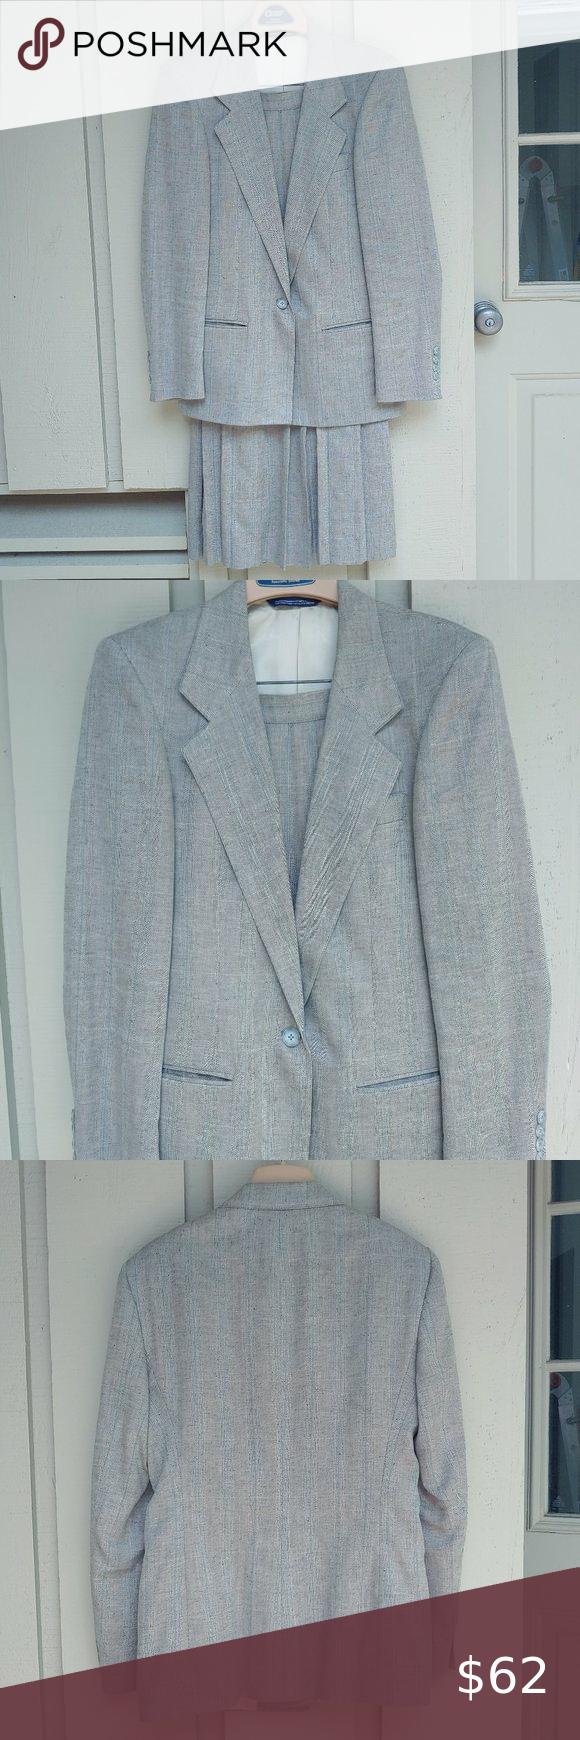 Vintage Austin Reed Suit Vintage Austin Coats Jackets Women Womens Maroon Blazer